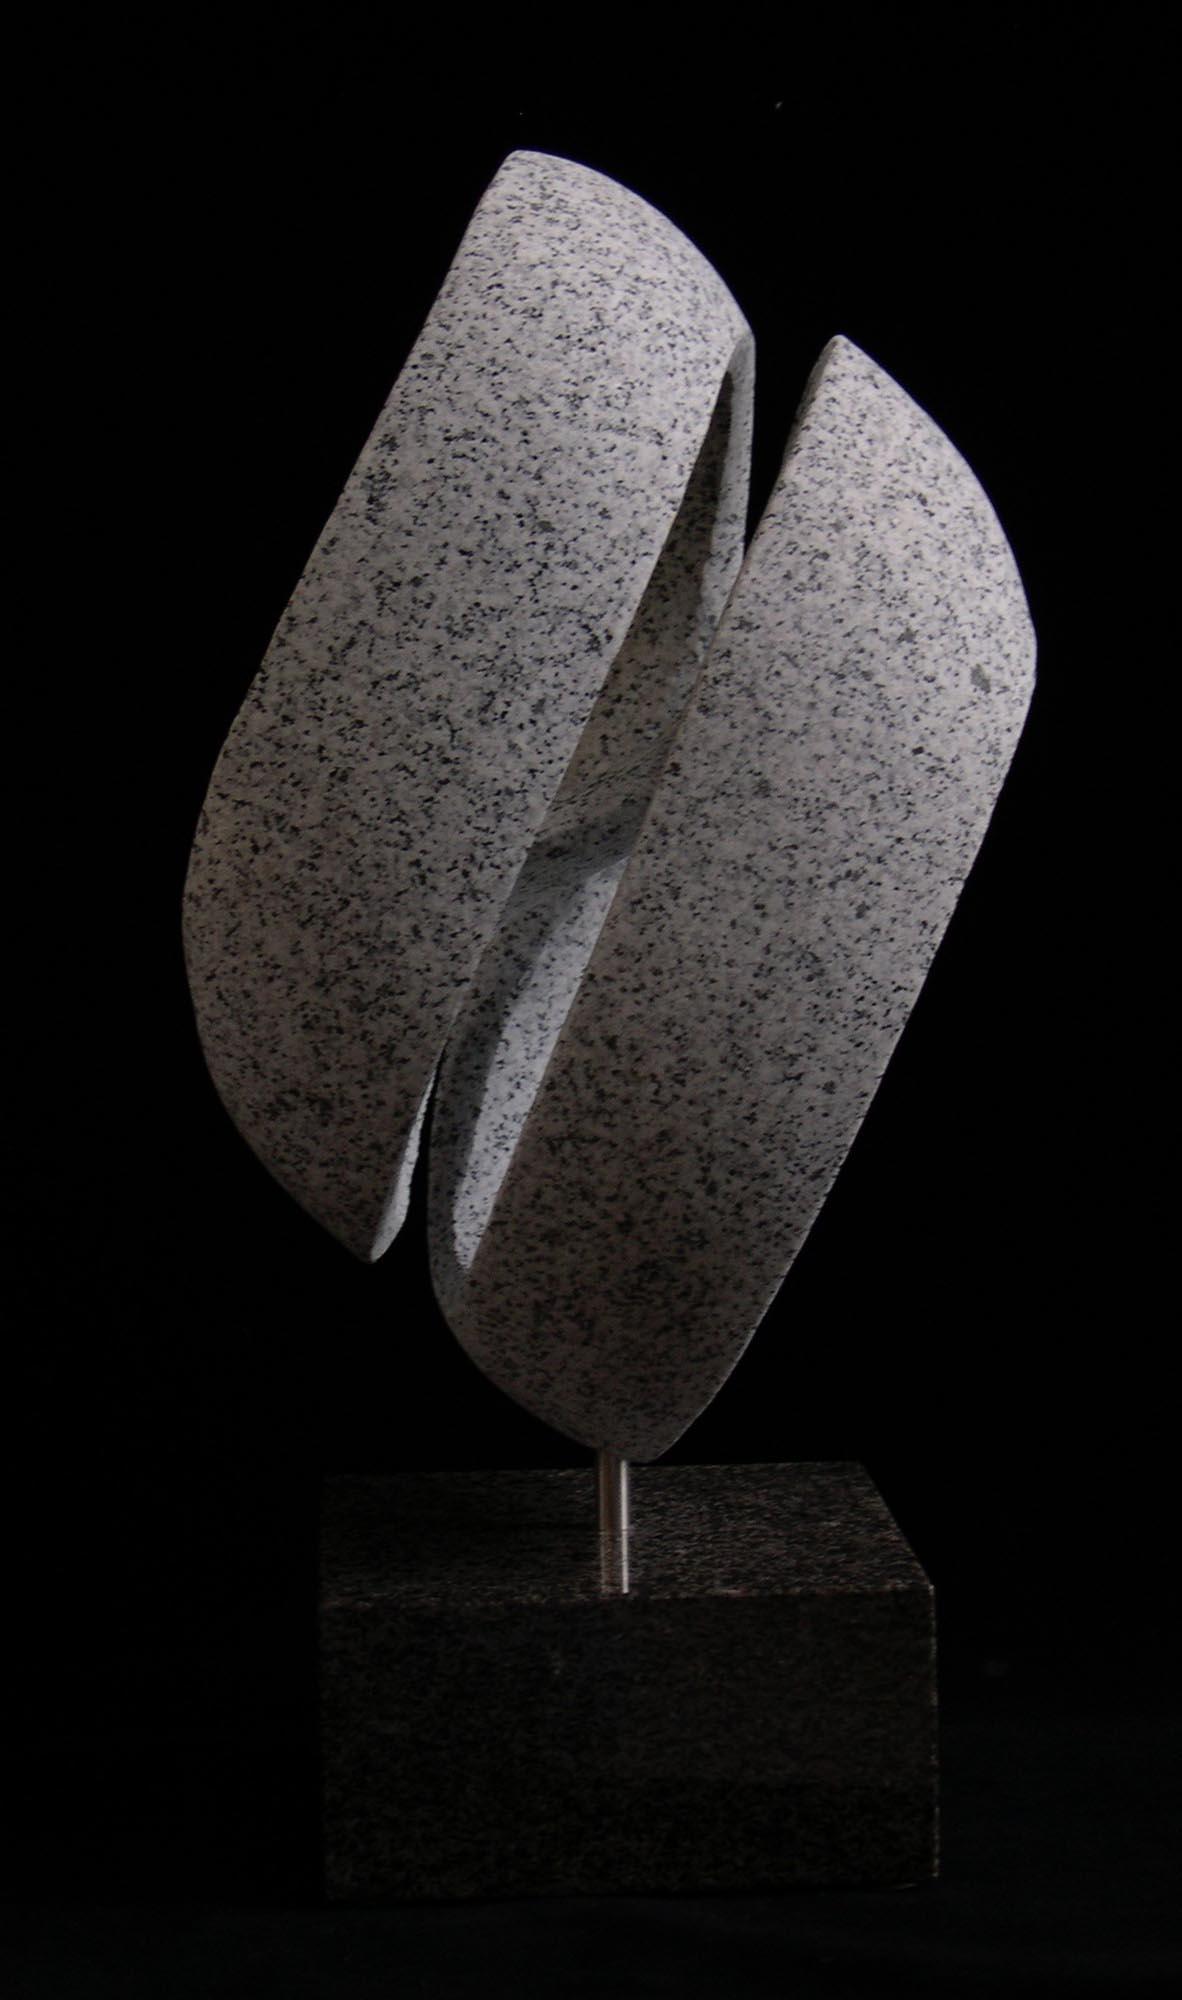 michael binkley sculptor stone sculpture artist abstract mobius granite statue vancouver canada